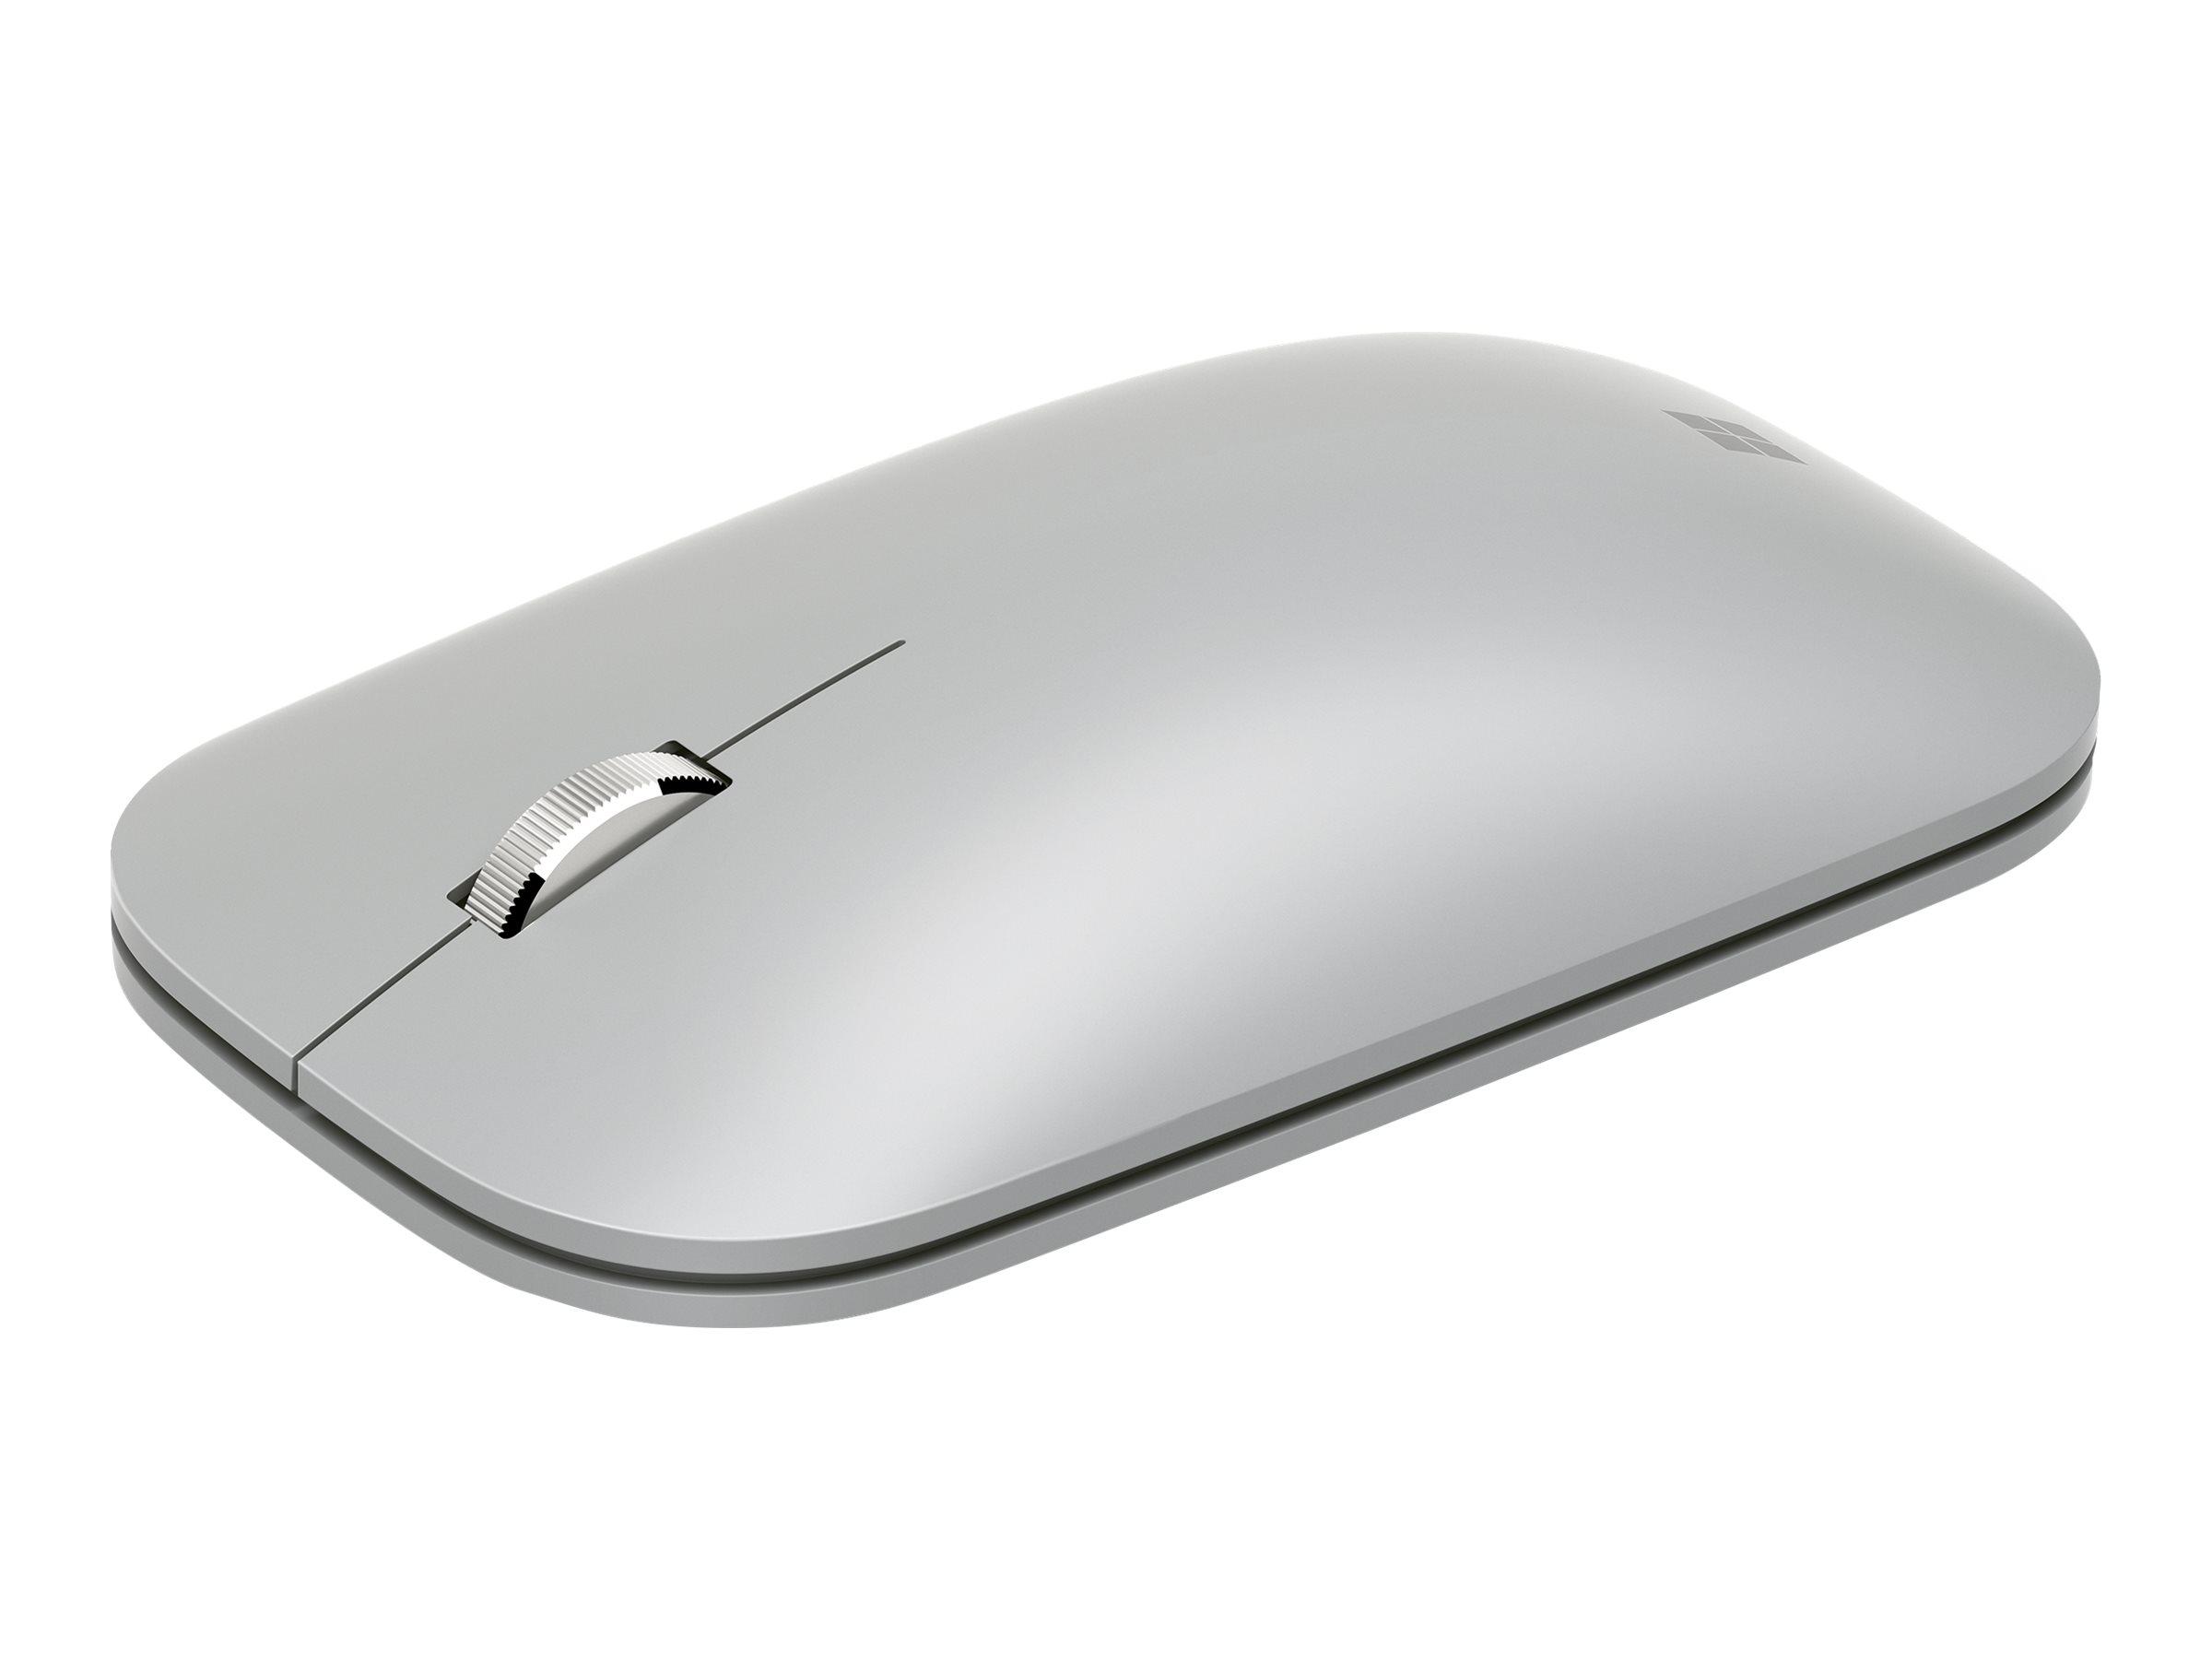 Surface mobile mouse maus optisch 3 tasten kabellos bluetooth 4 2 9321946 kgy 00002